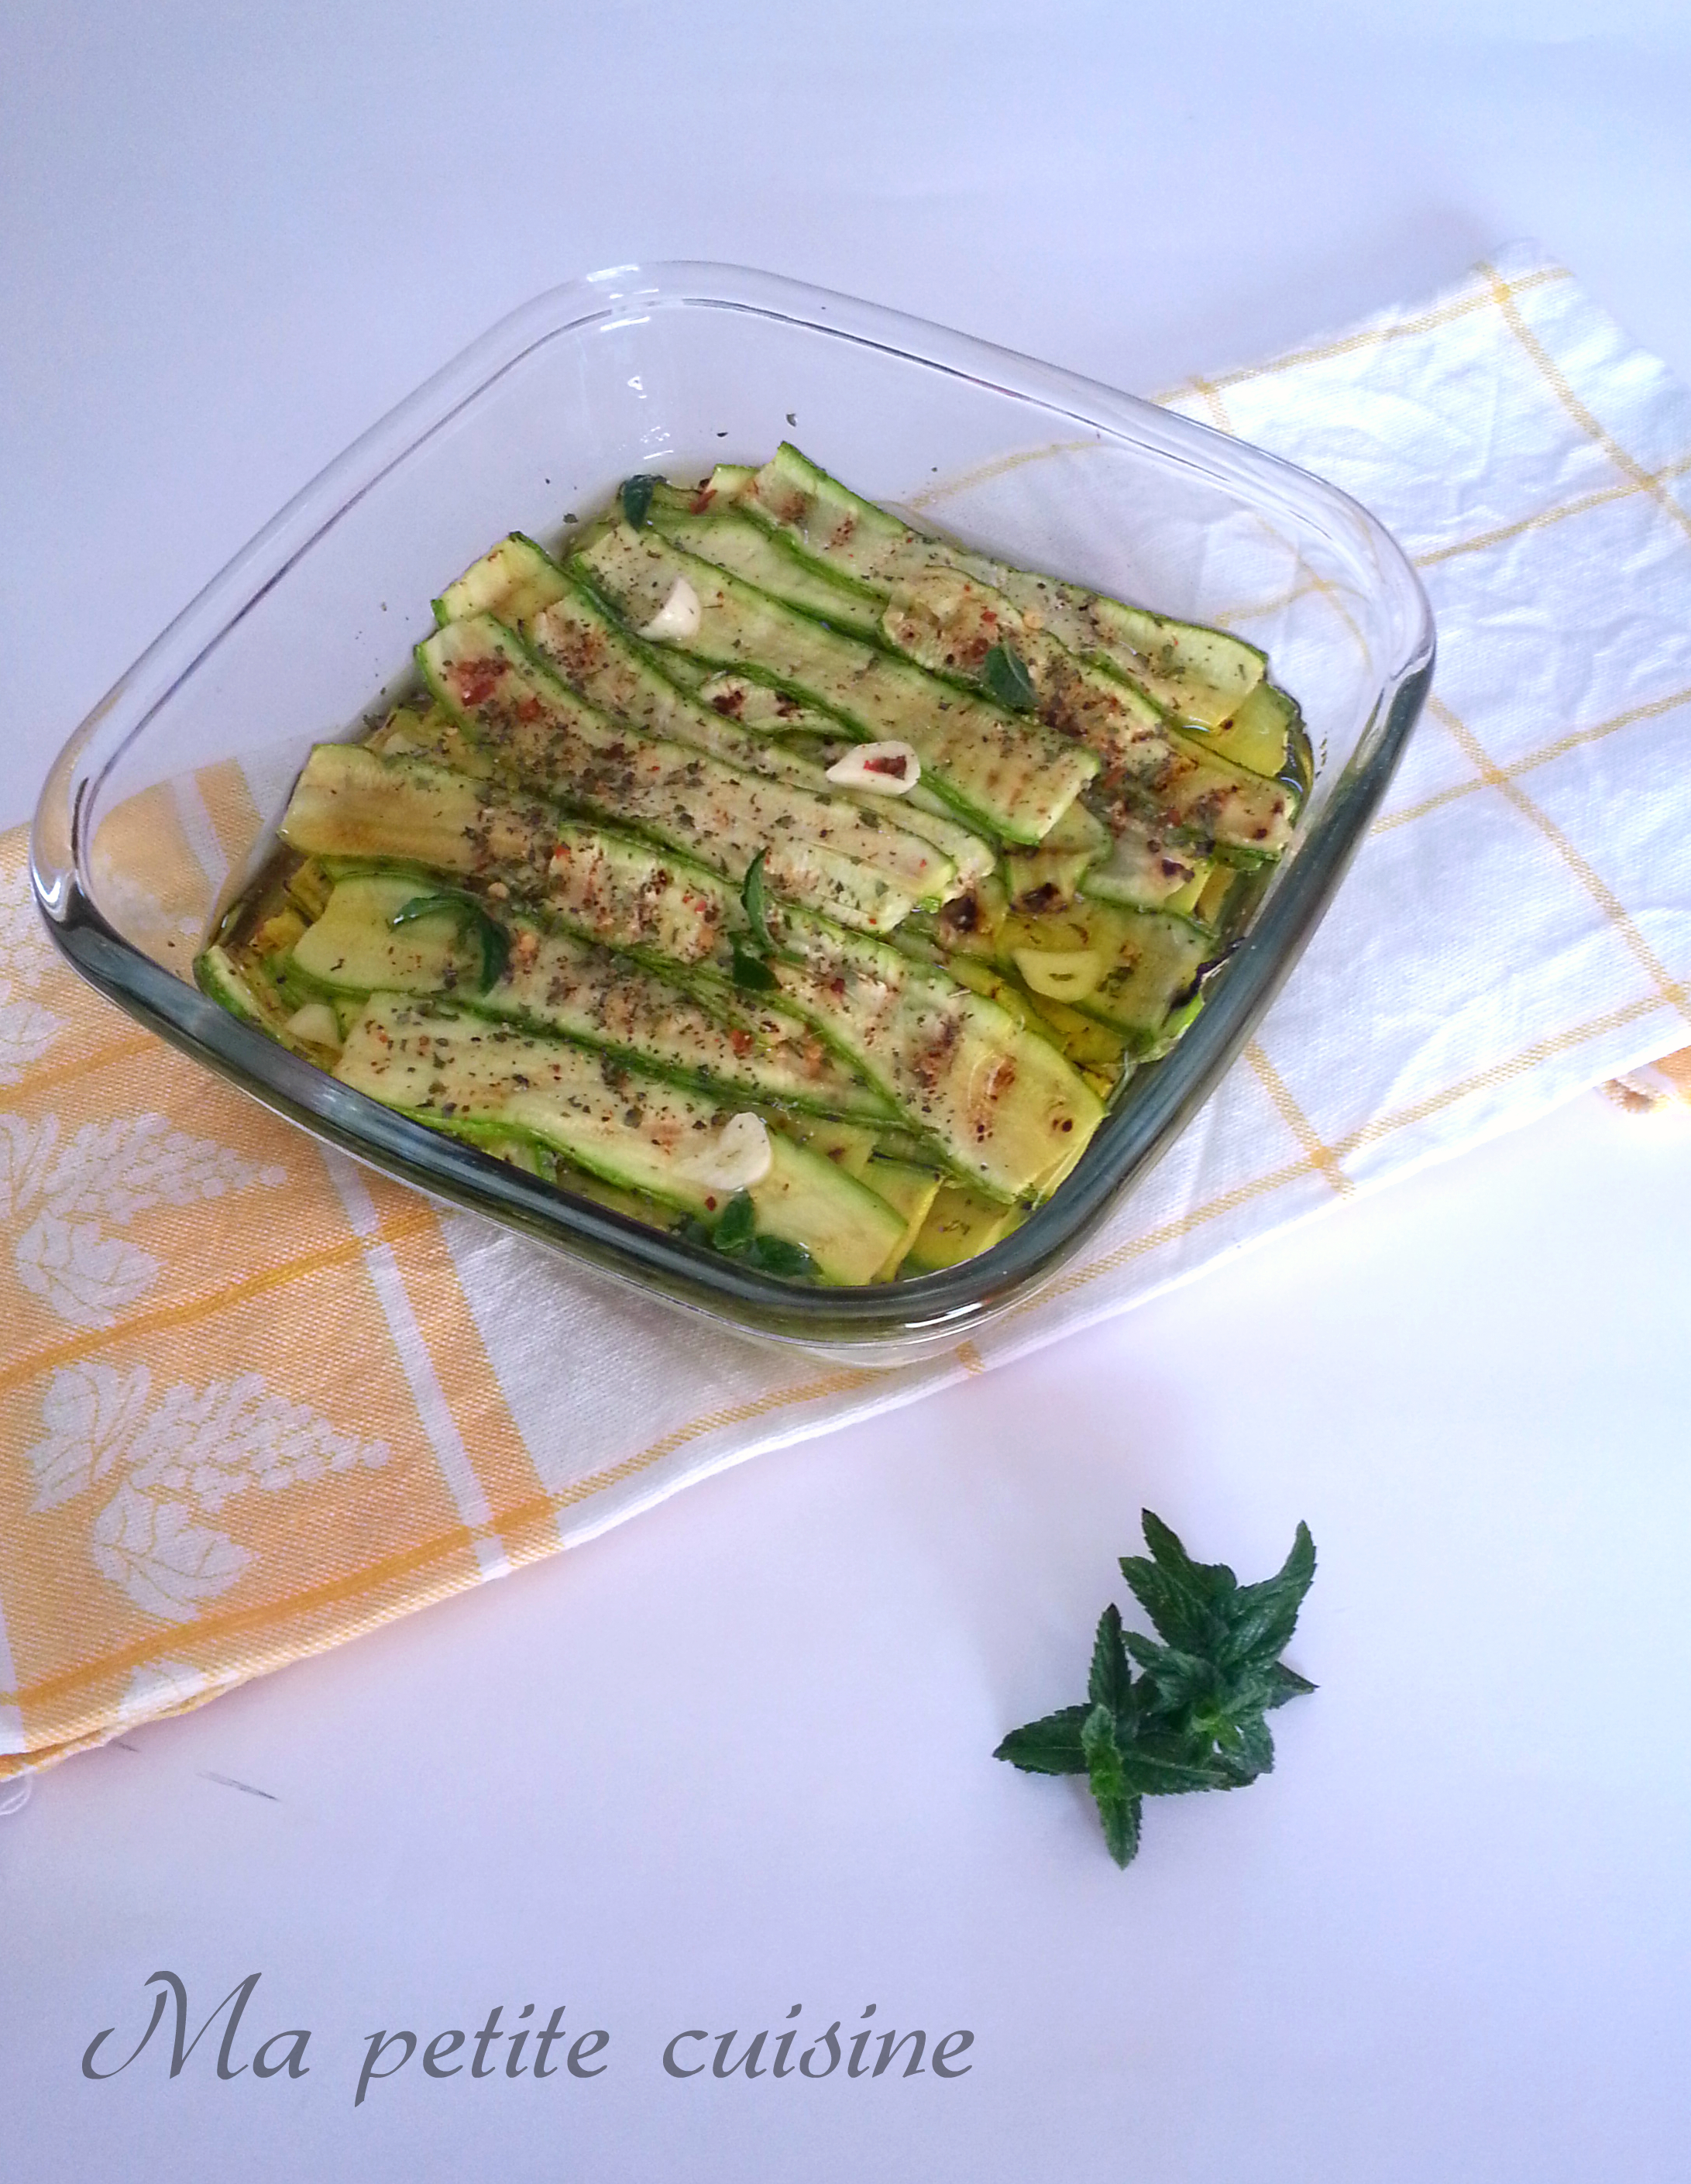 Ricetta biscotti torta zucchine grigliate sott olio ricetta for Cucinare zucchine trombetta